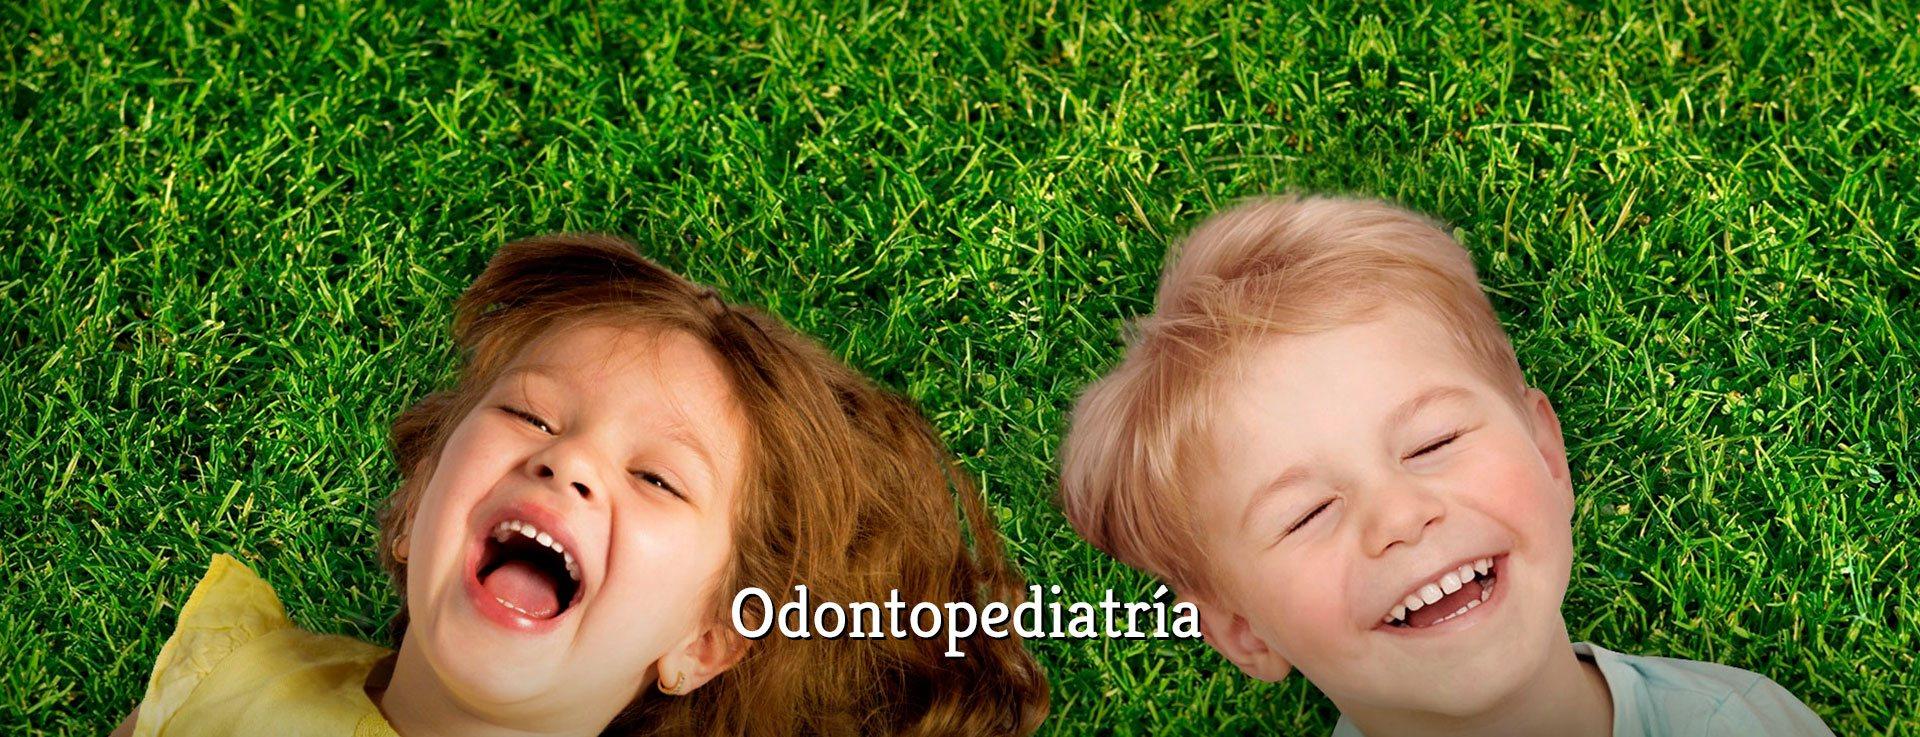 Odontopediatría - Clínica Corpodental